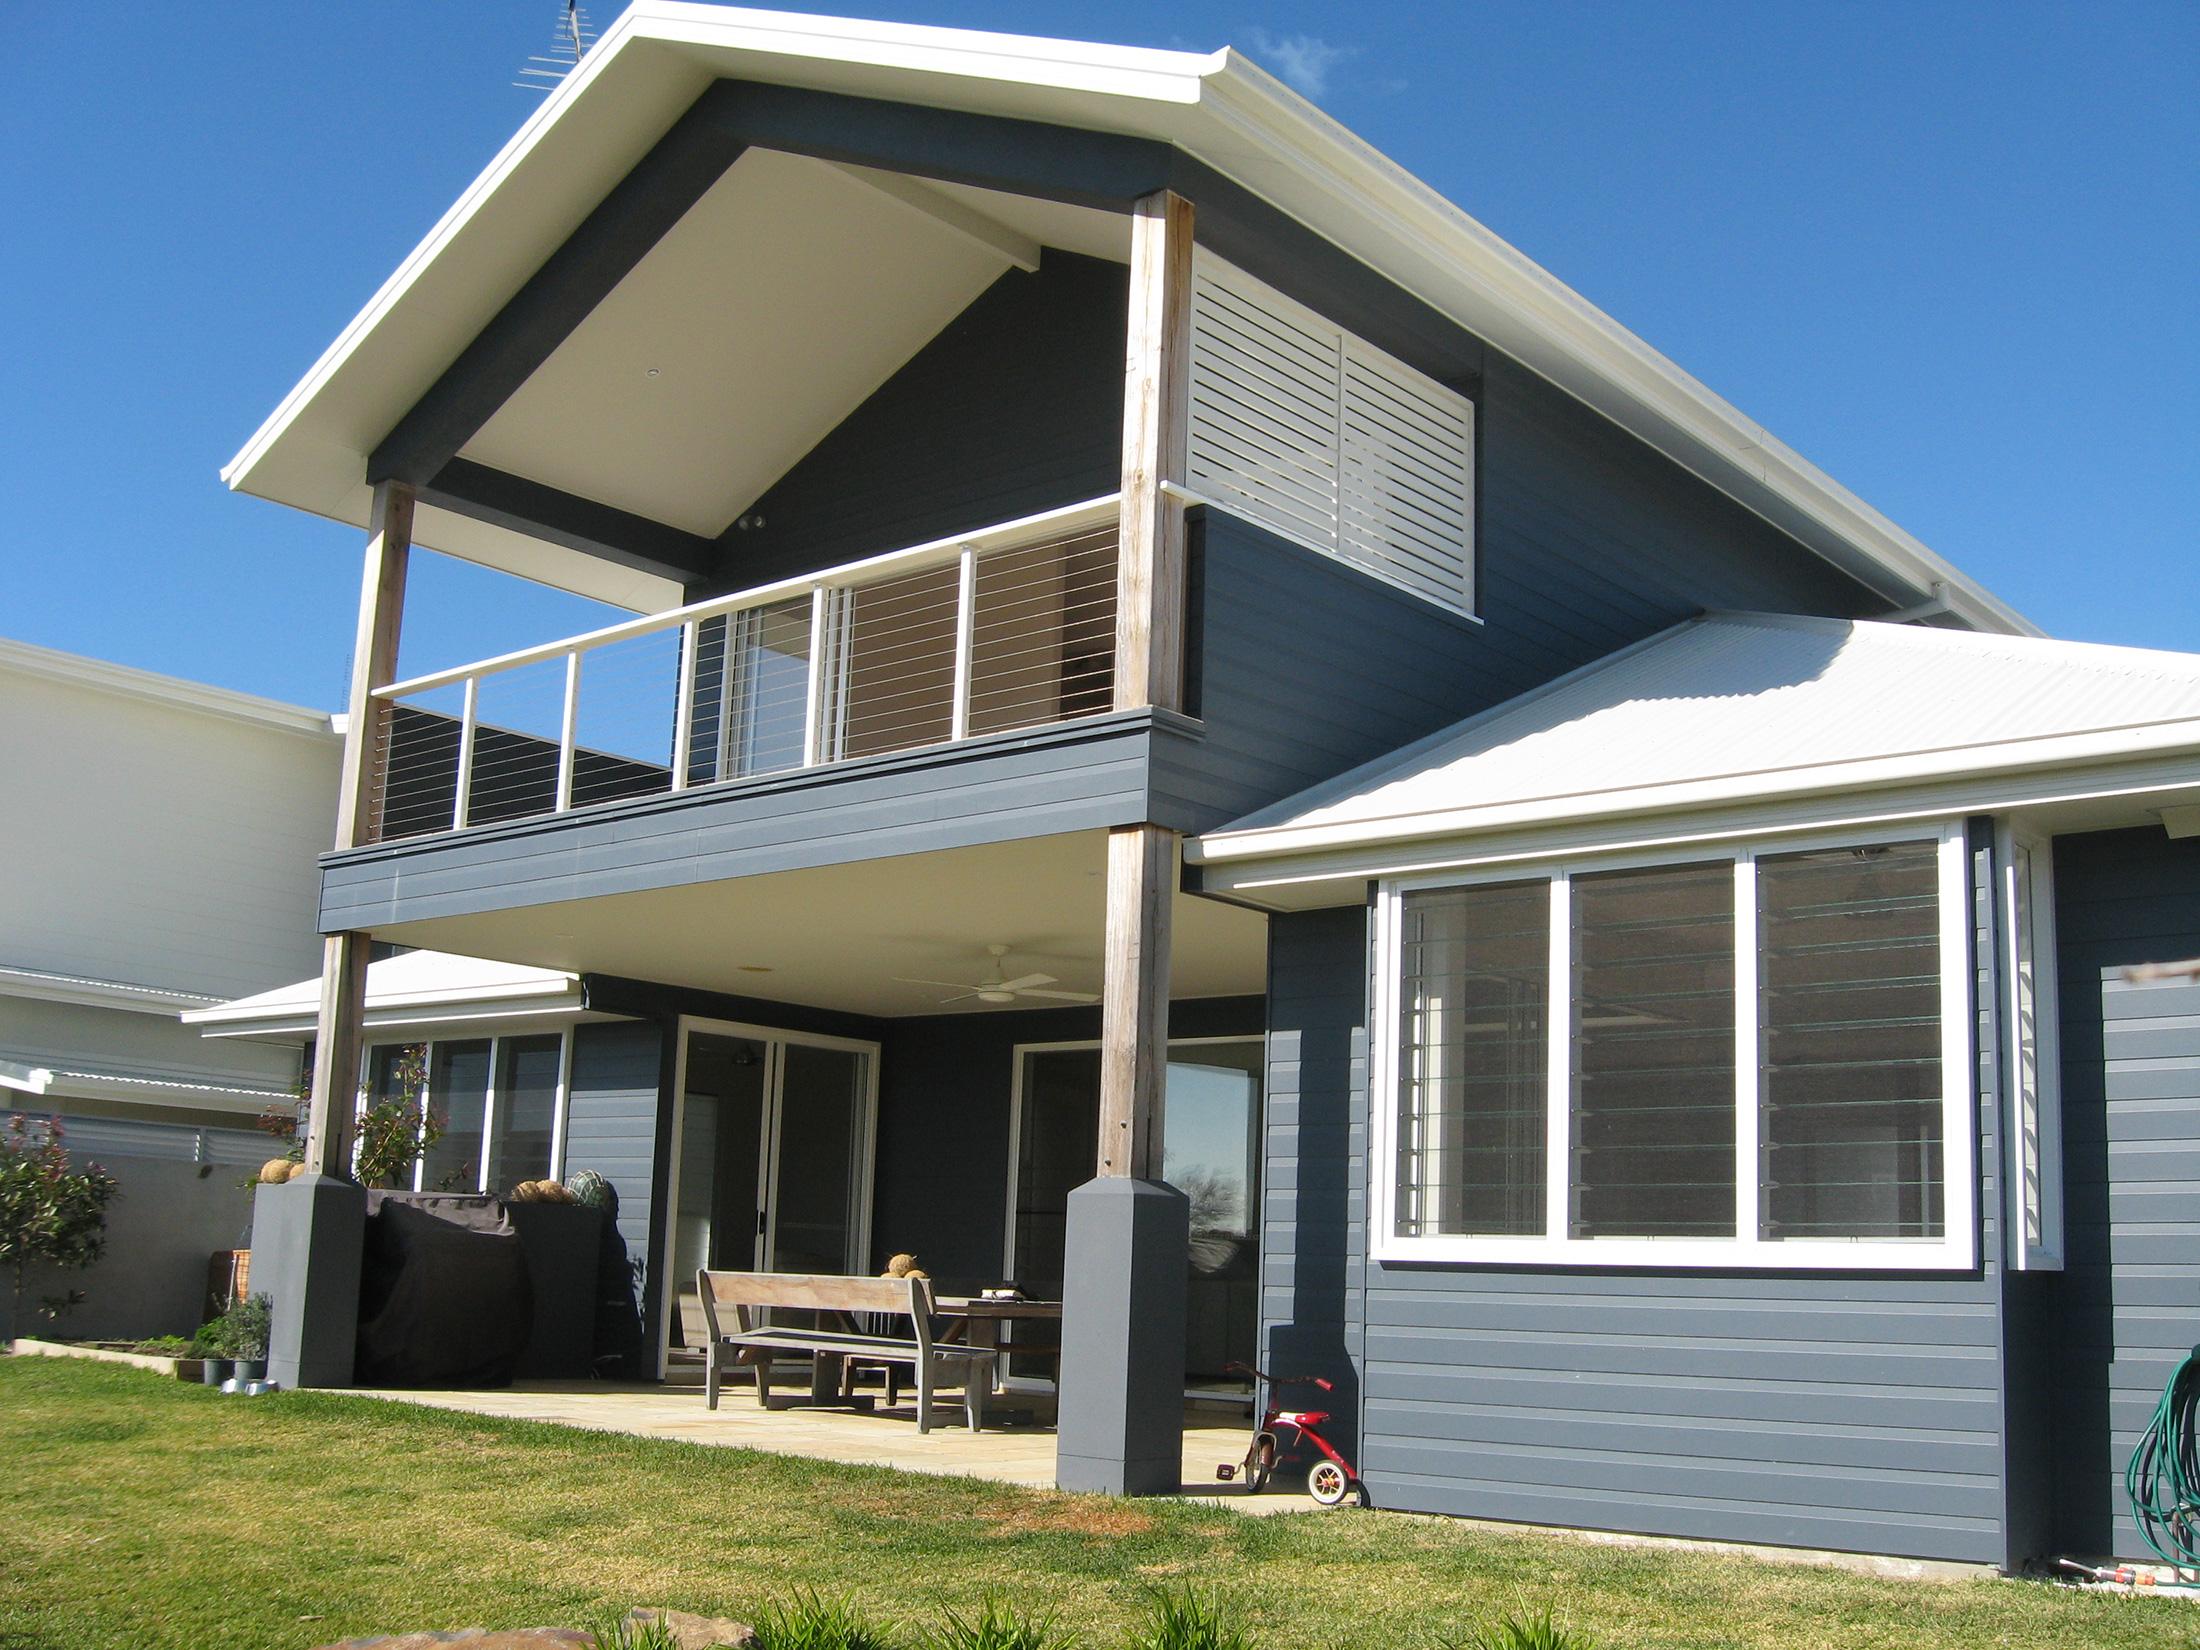 hamptons-beach-shack.jpg